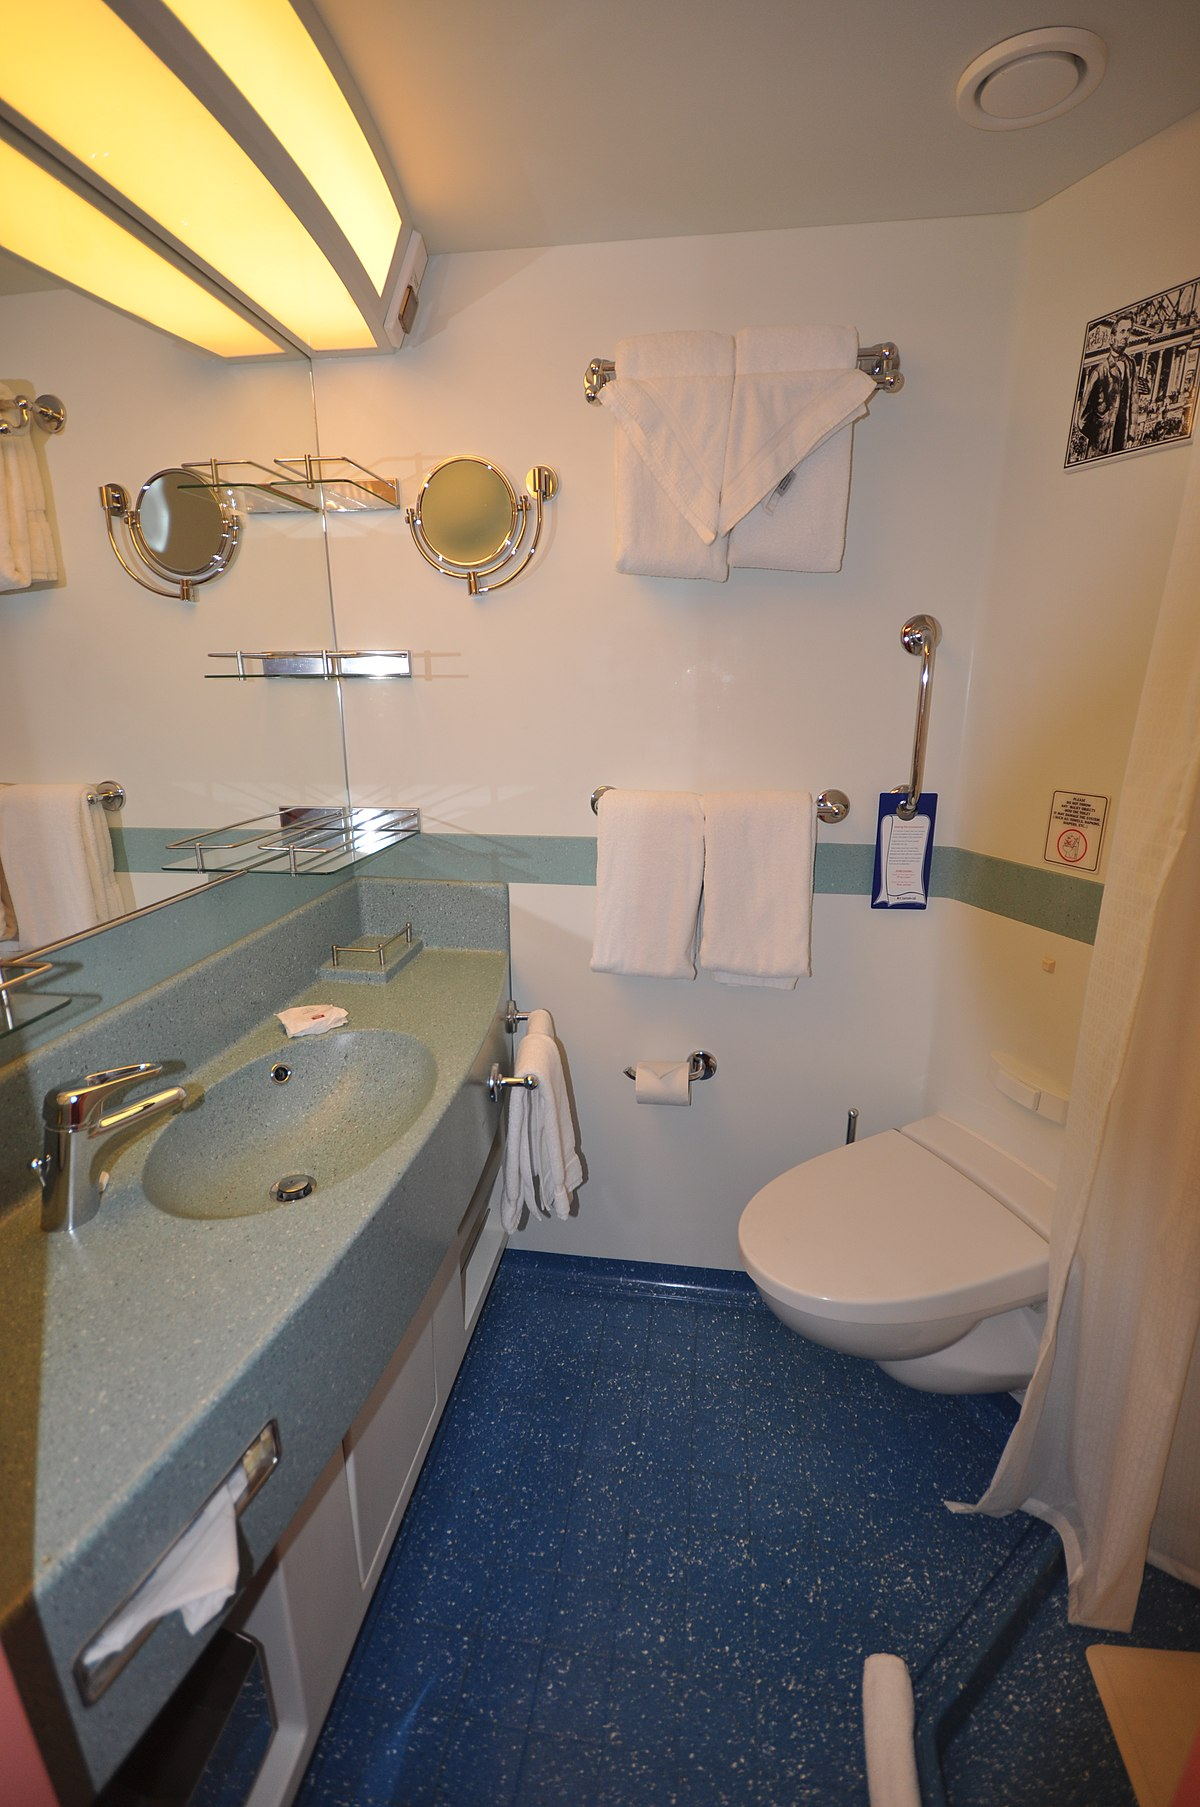 Salle De Bain Low Cost file:salle de bain carnival valor - wikimedia commons